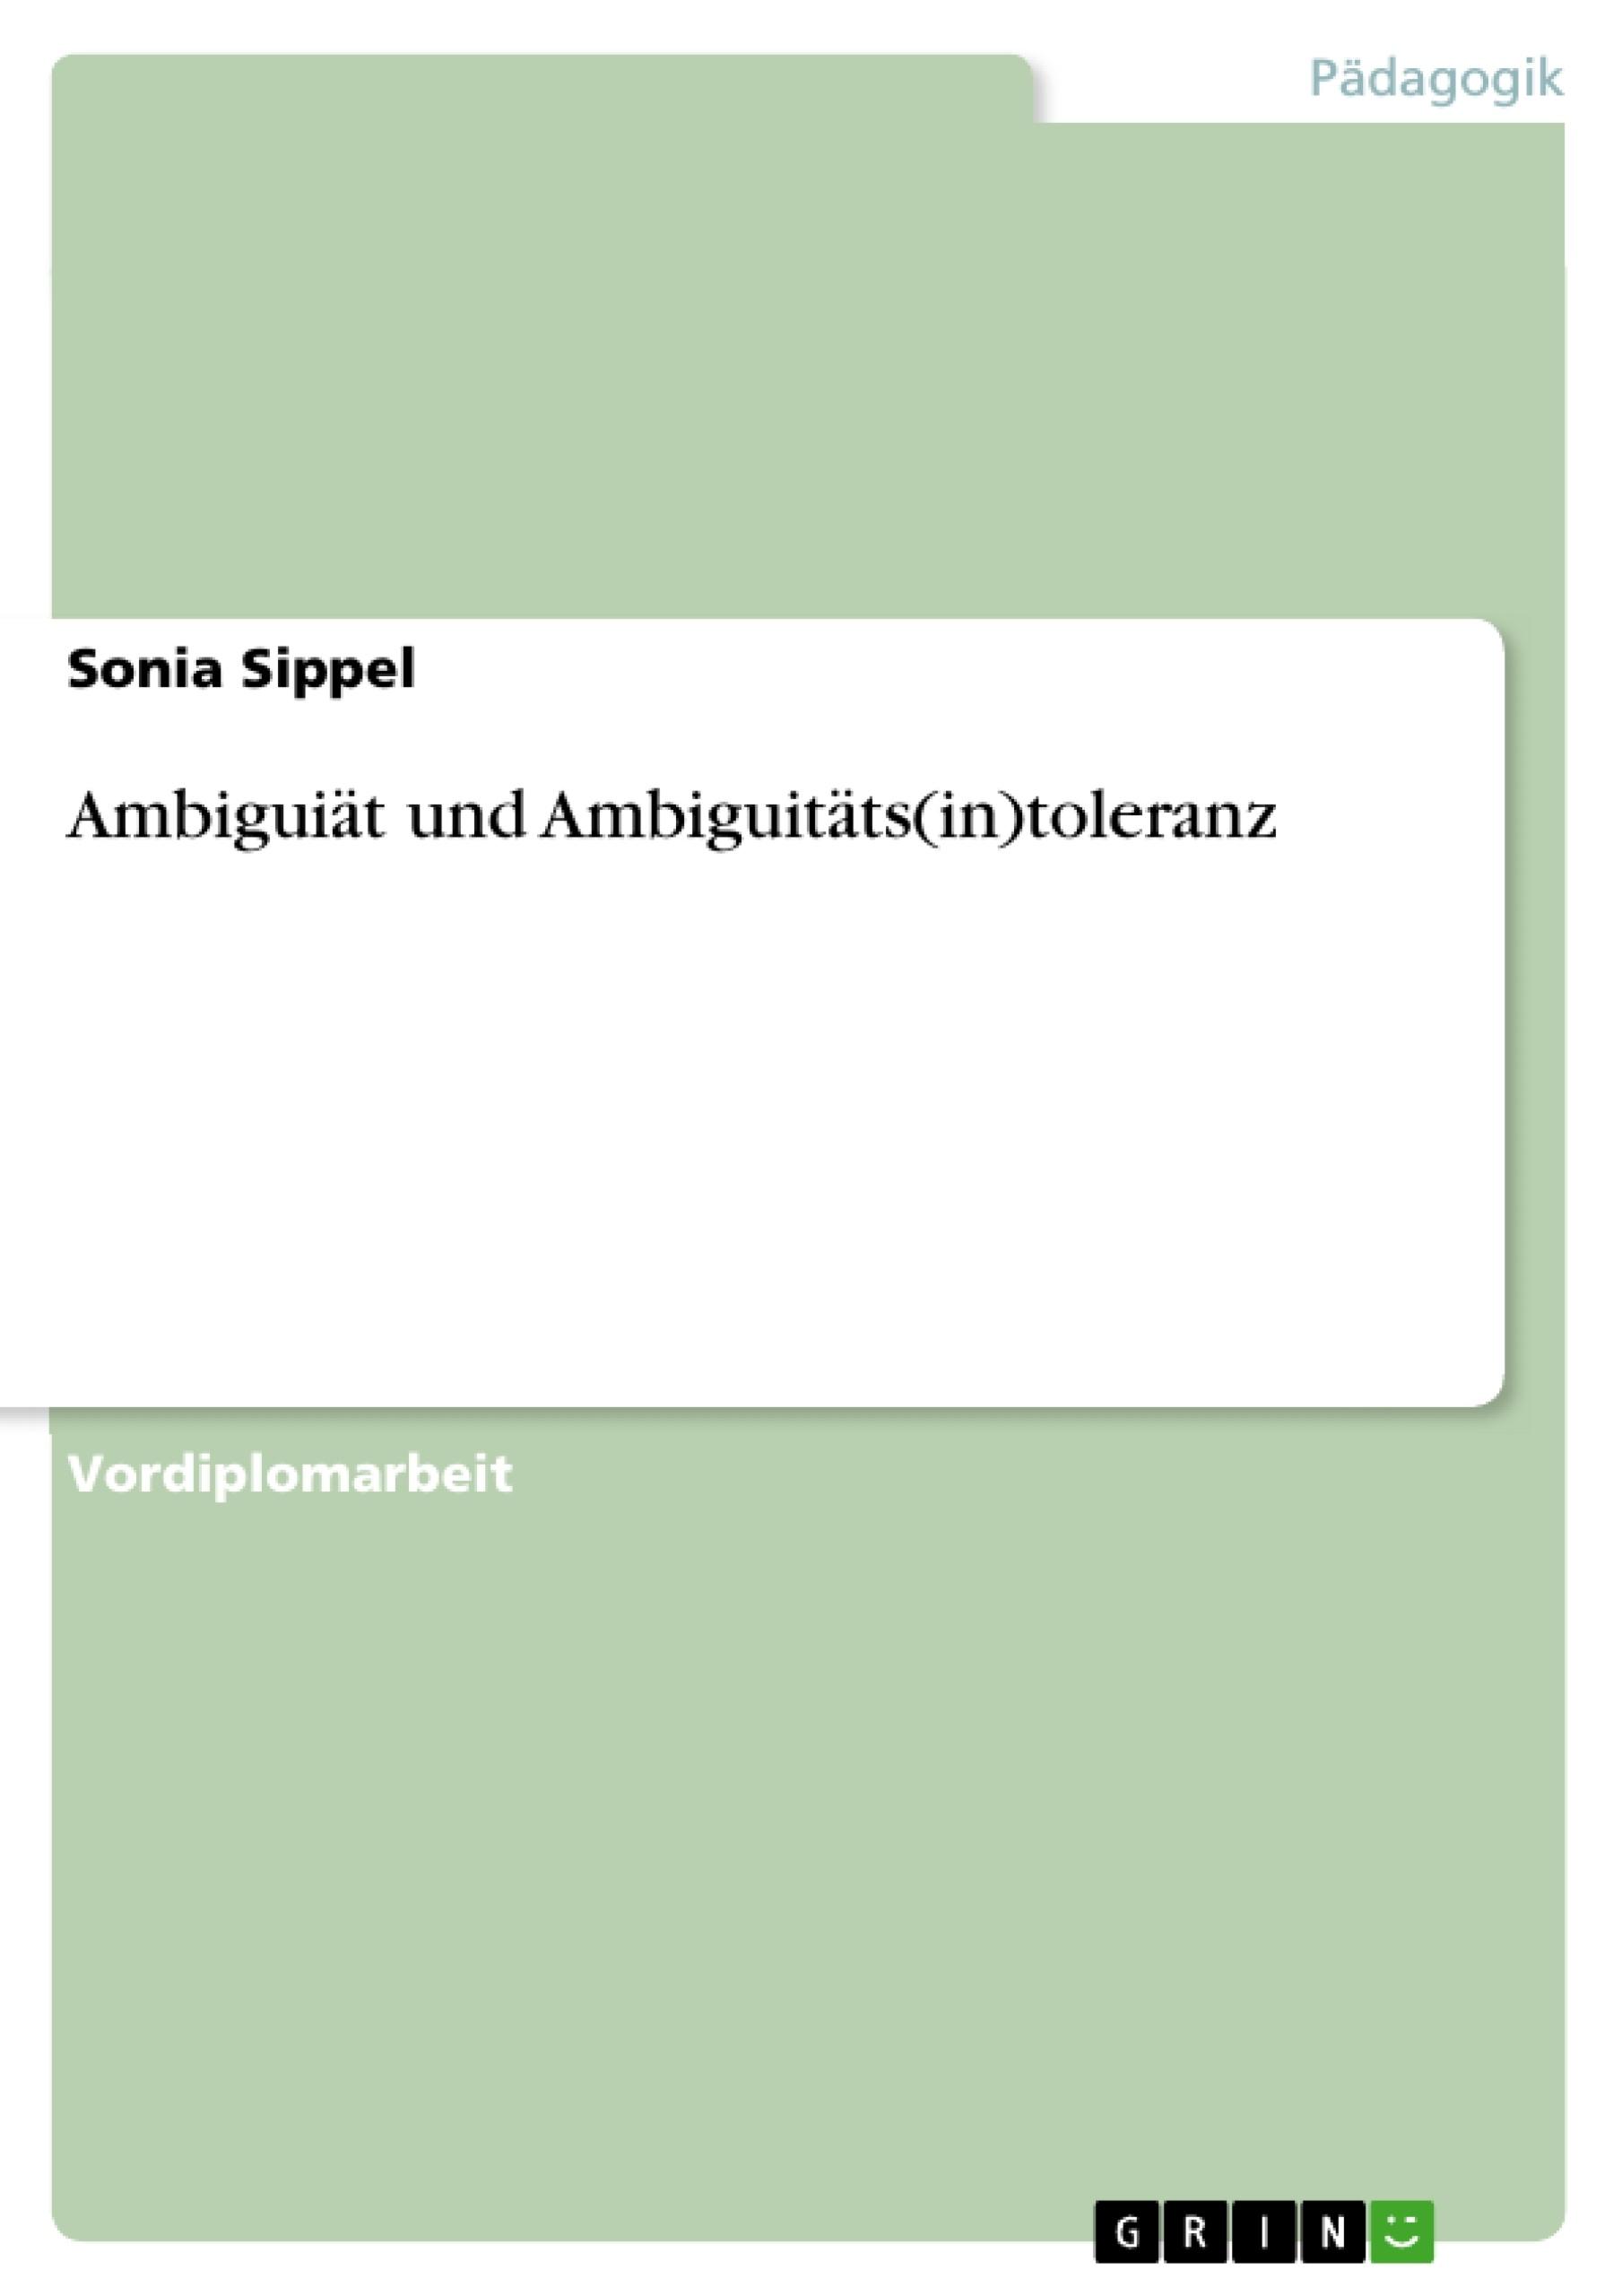 Titel: Ambiguiät und Ambiguitäts(in)toleranz